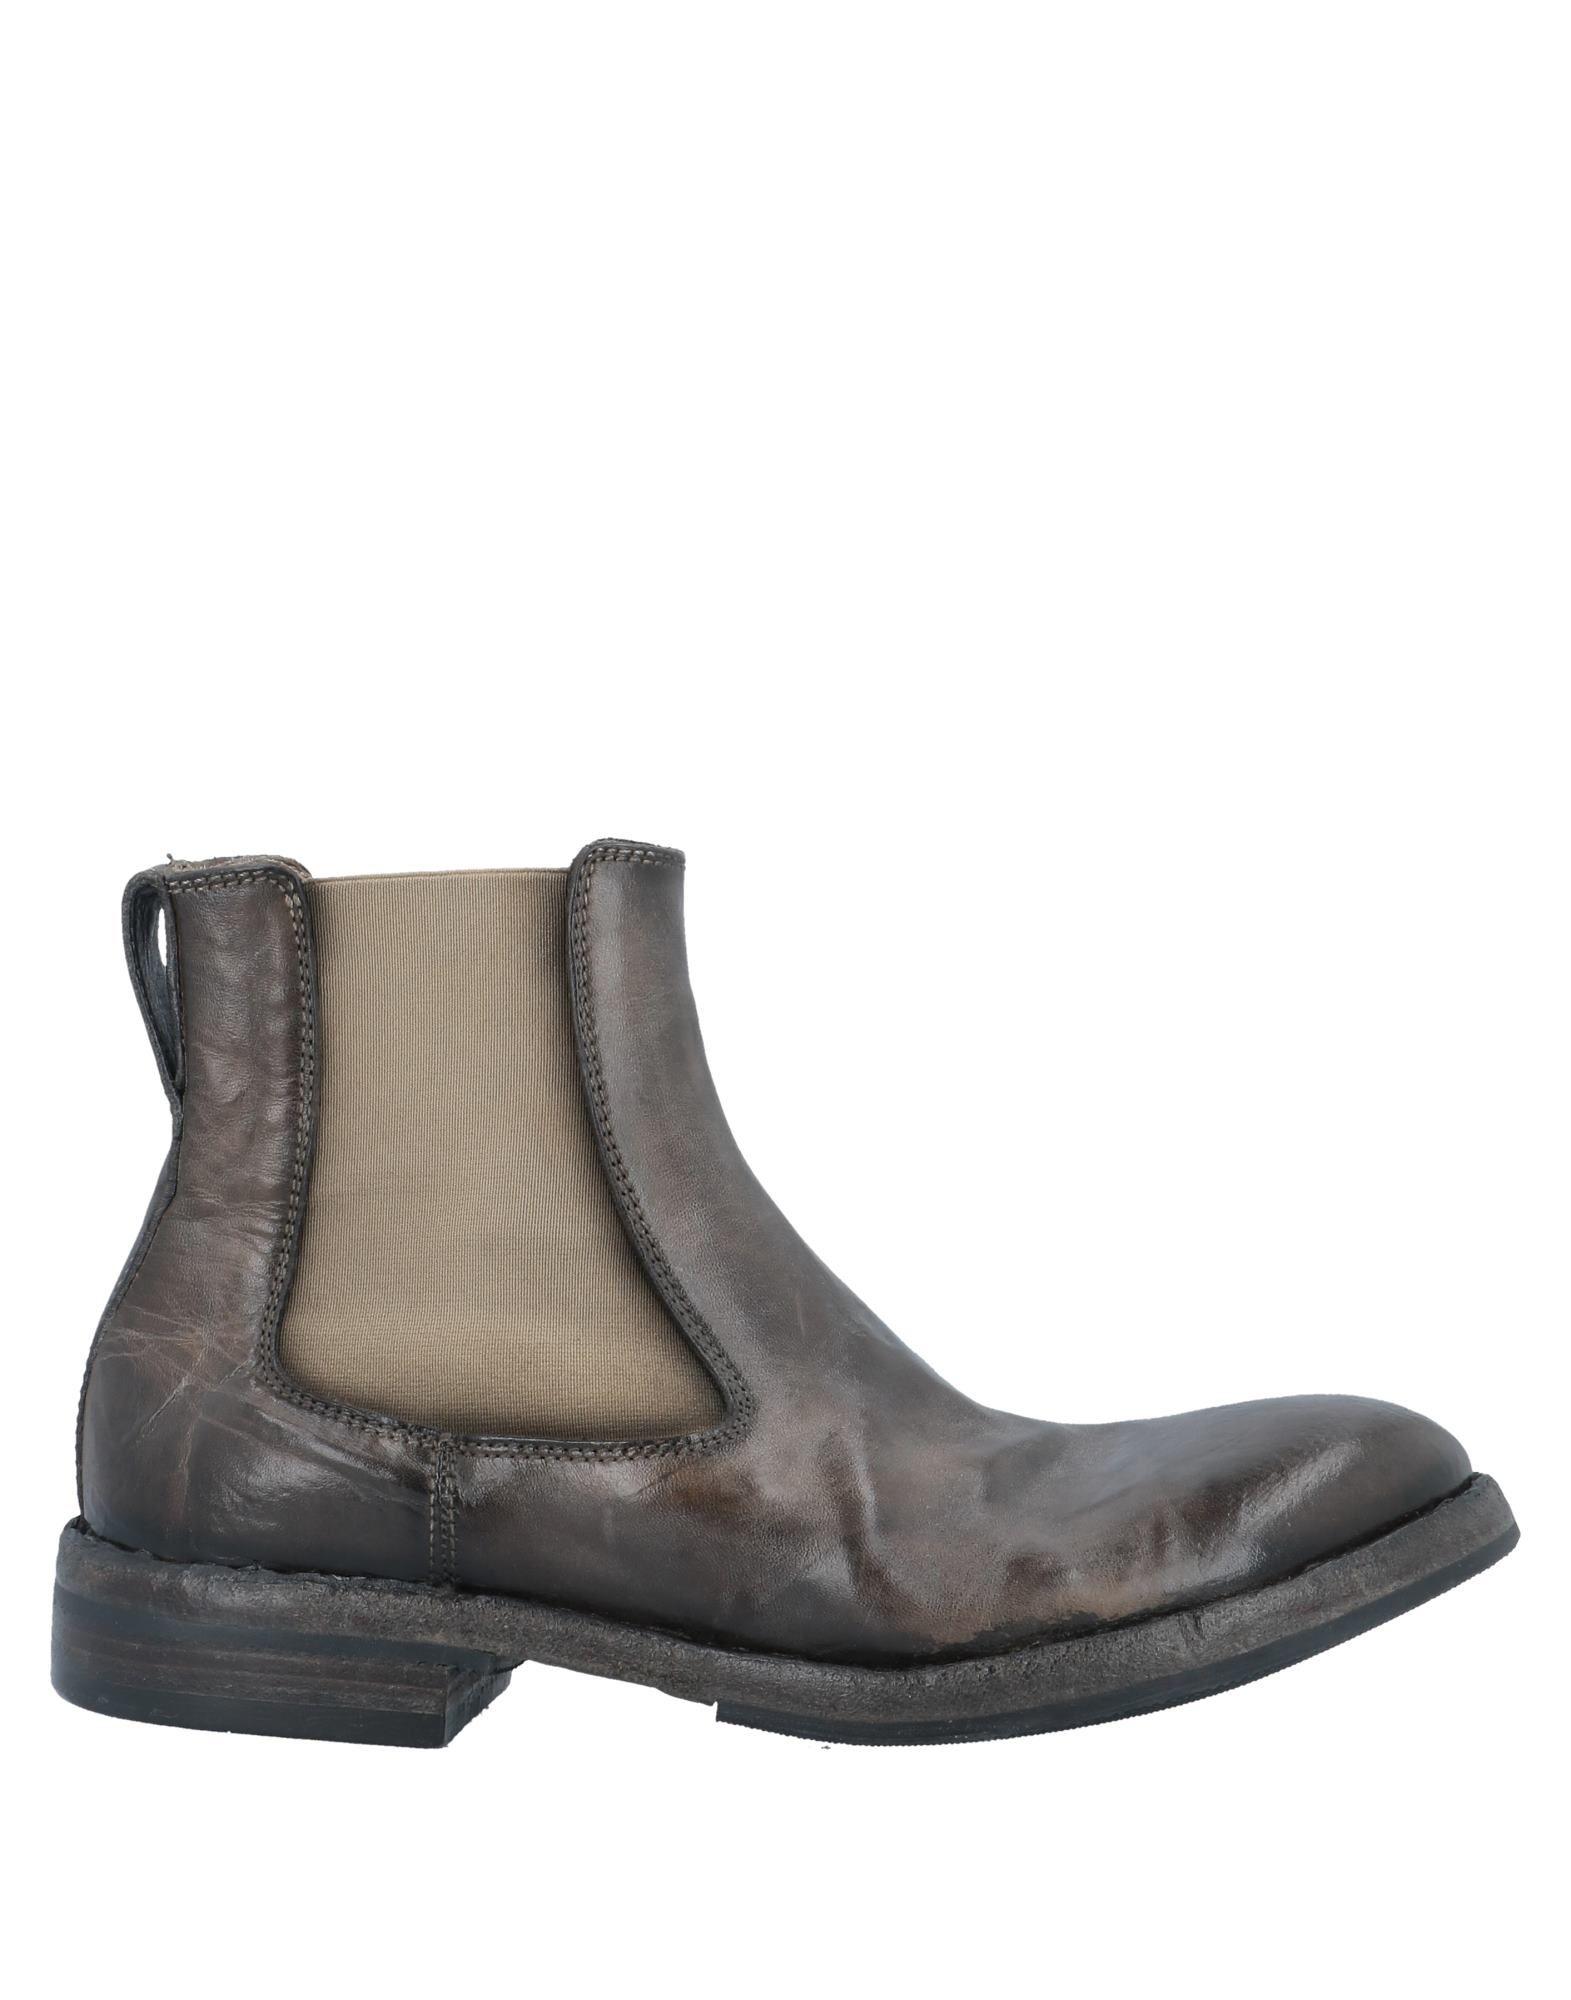 OPEN CLOSED SHOES Полусапоги и высокие ботинки open closed shoes мокасины